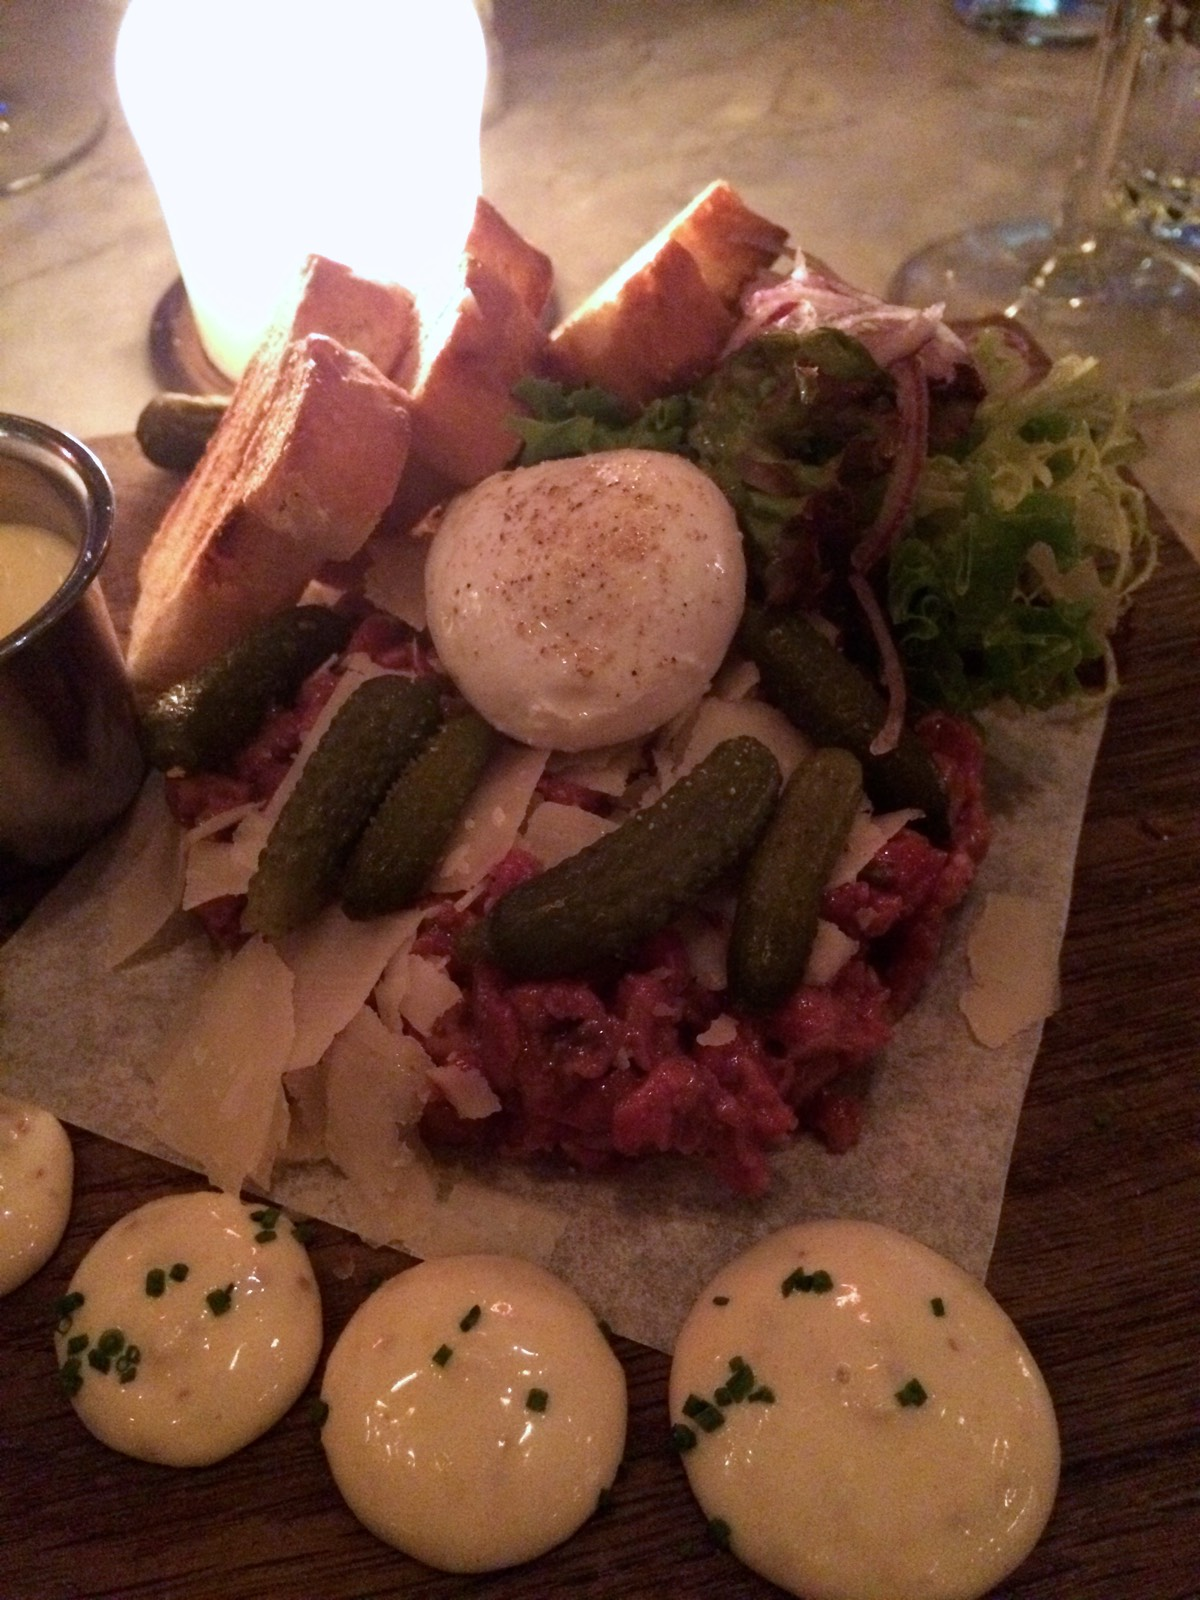 Seymour_food2_Haarlem